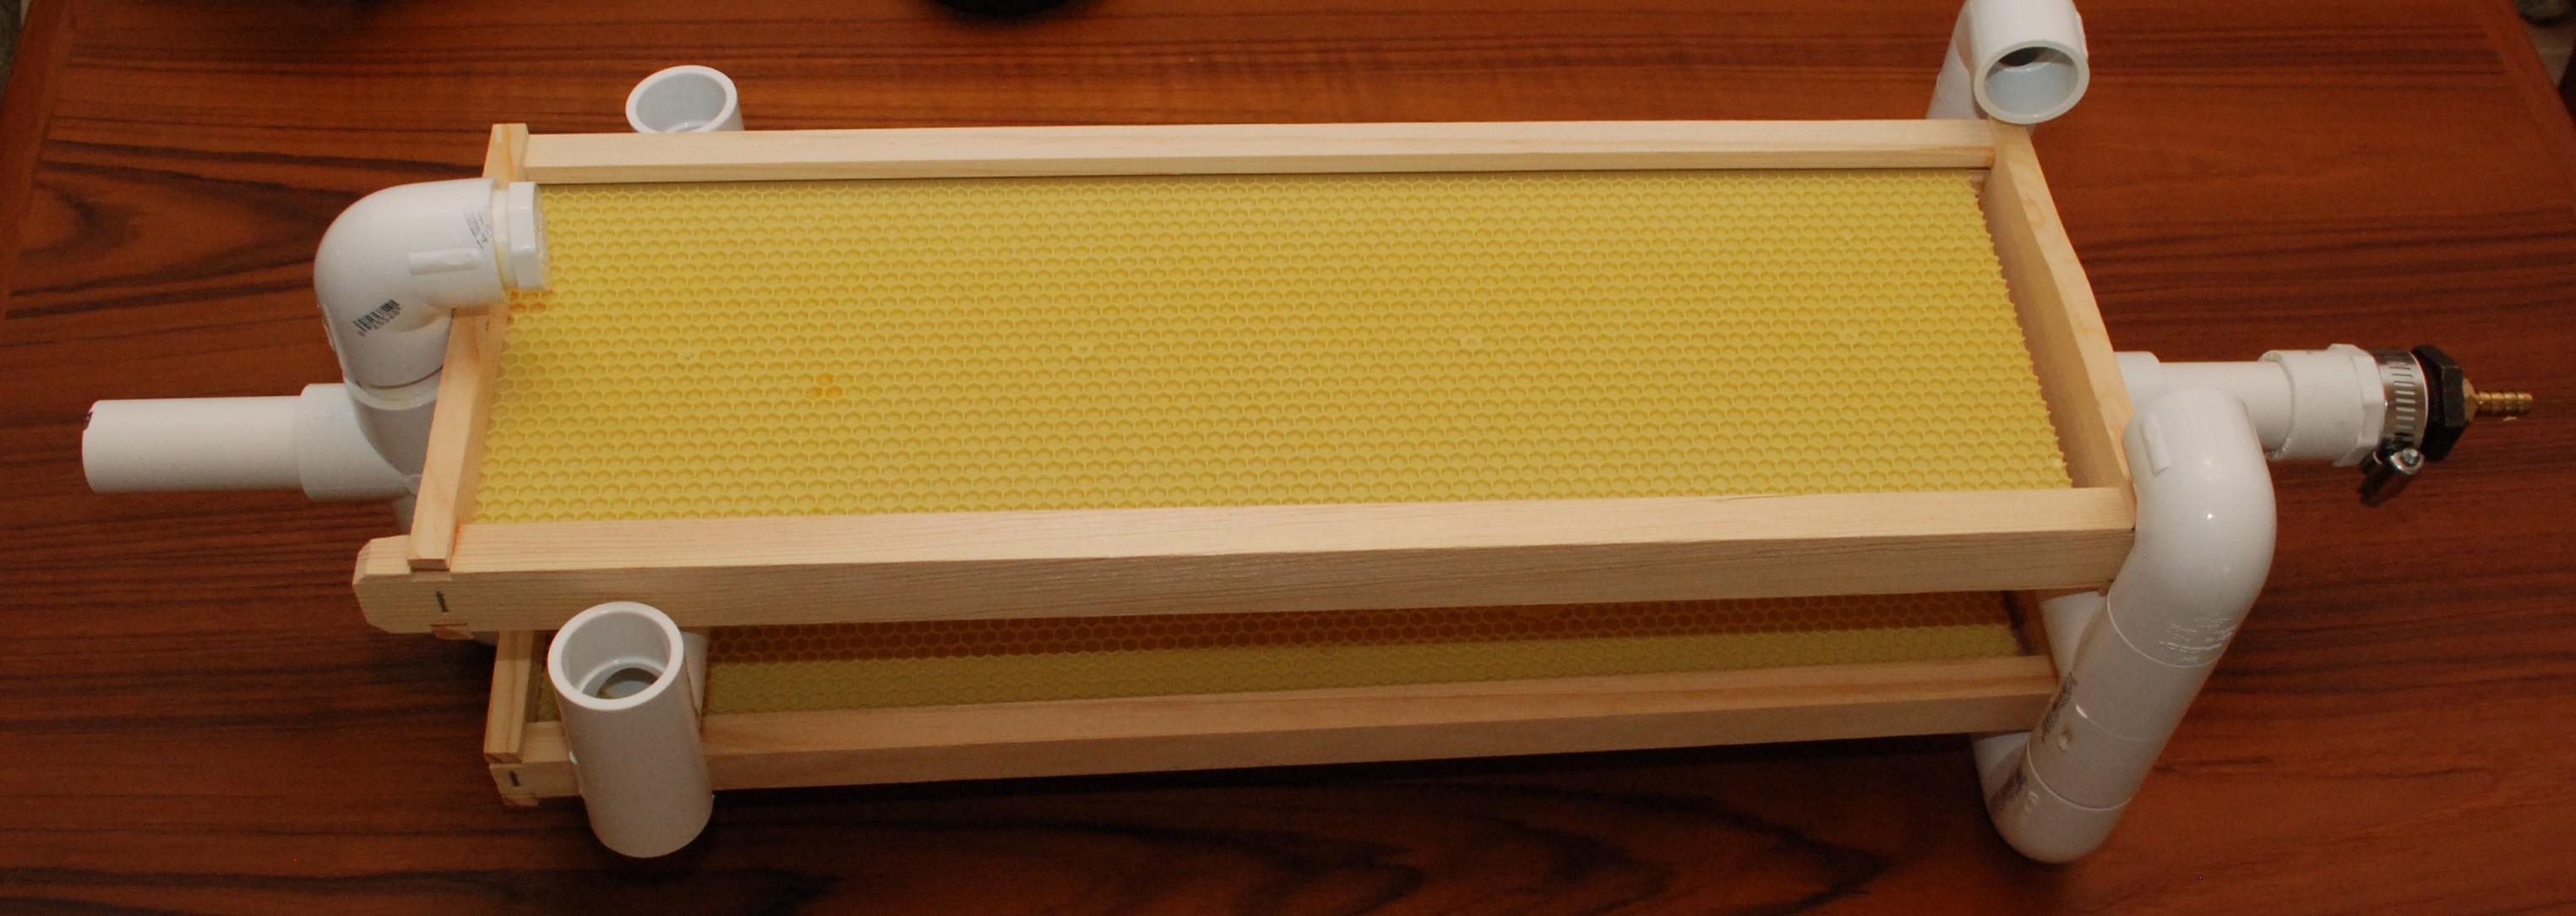 Honey Kilted Craft Works